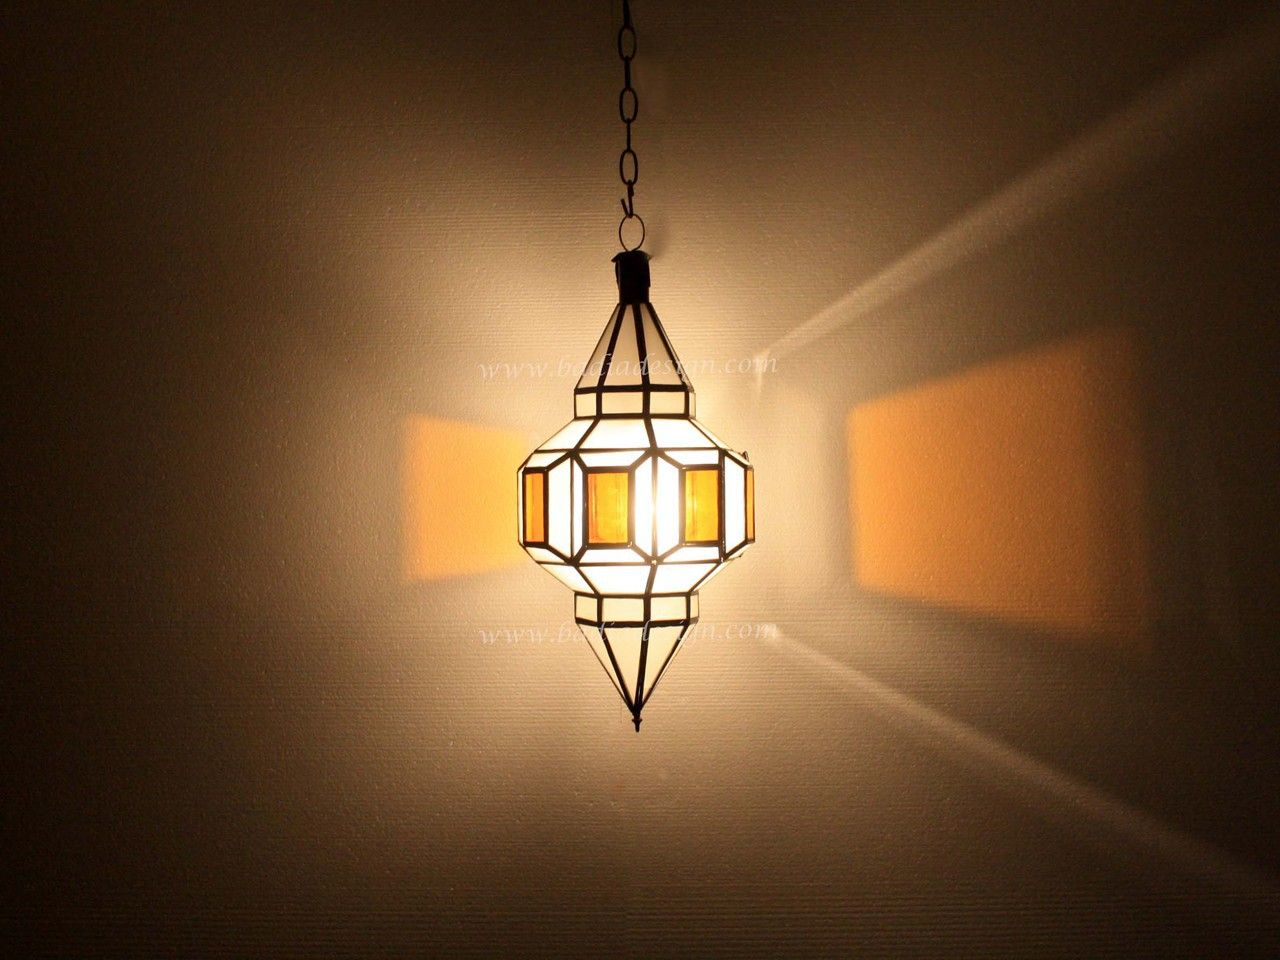 Superior Badia Design Inc Store   Hanging Lantern With Amber And Soft White Glassu2026 Awesome Ideas